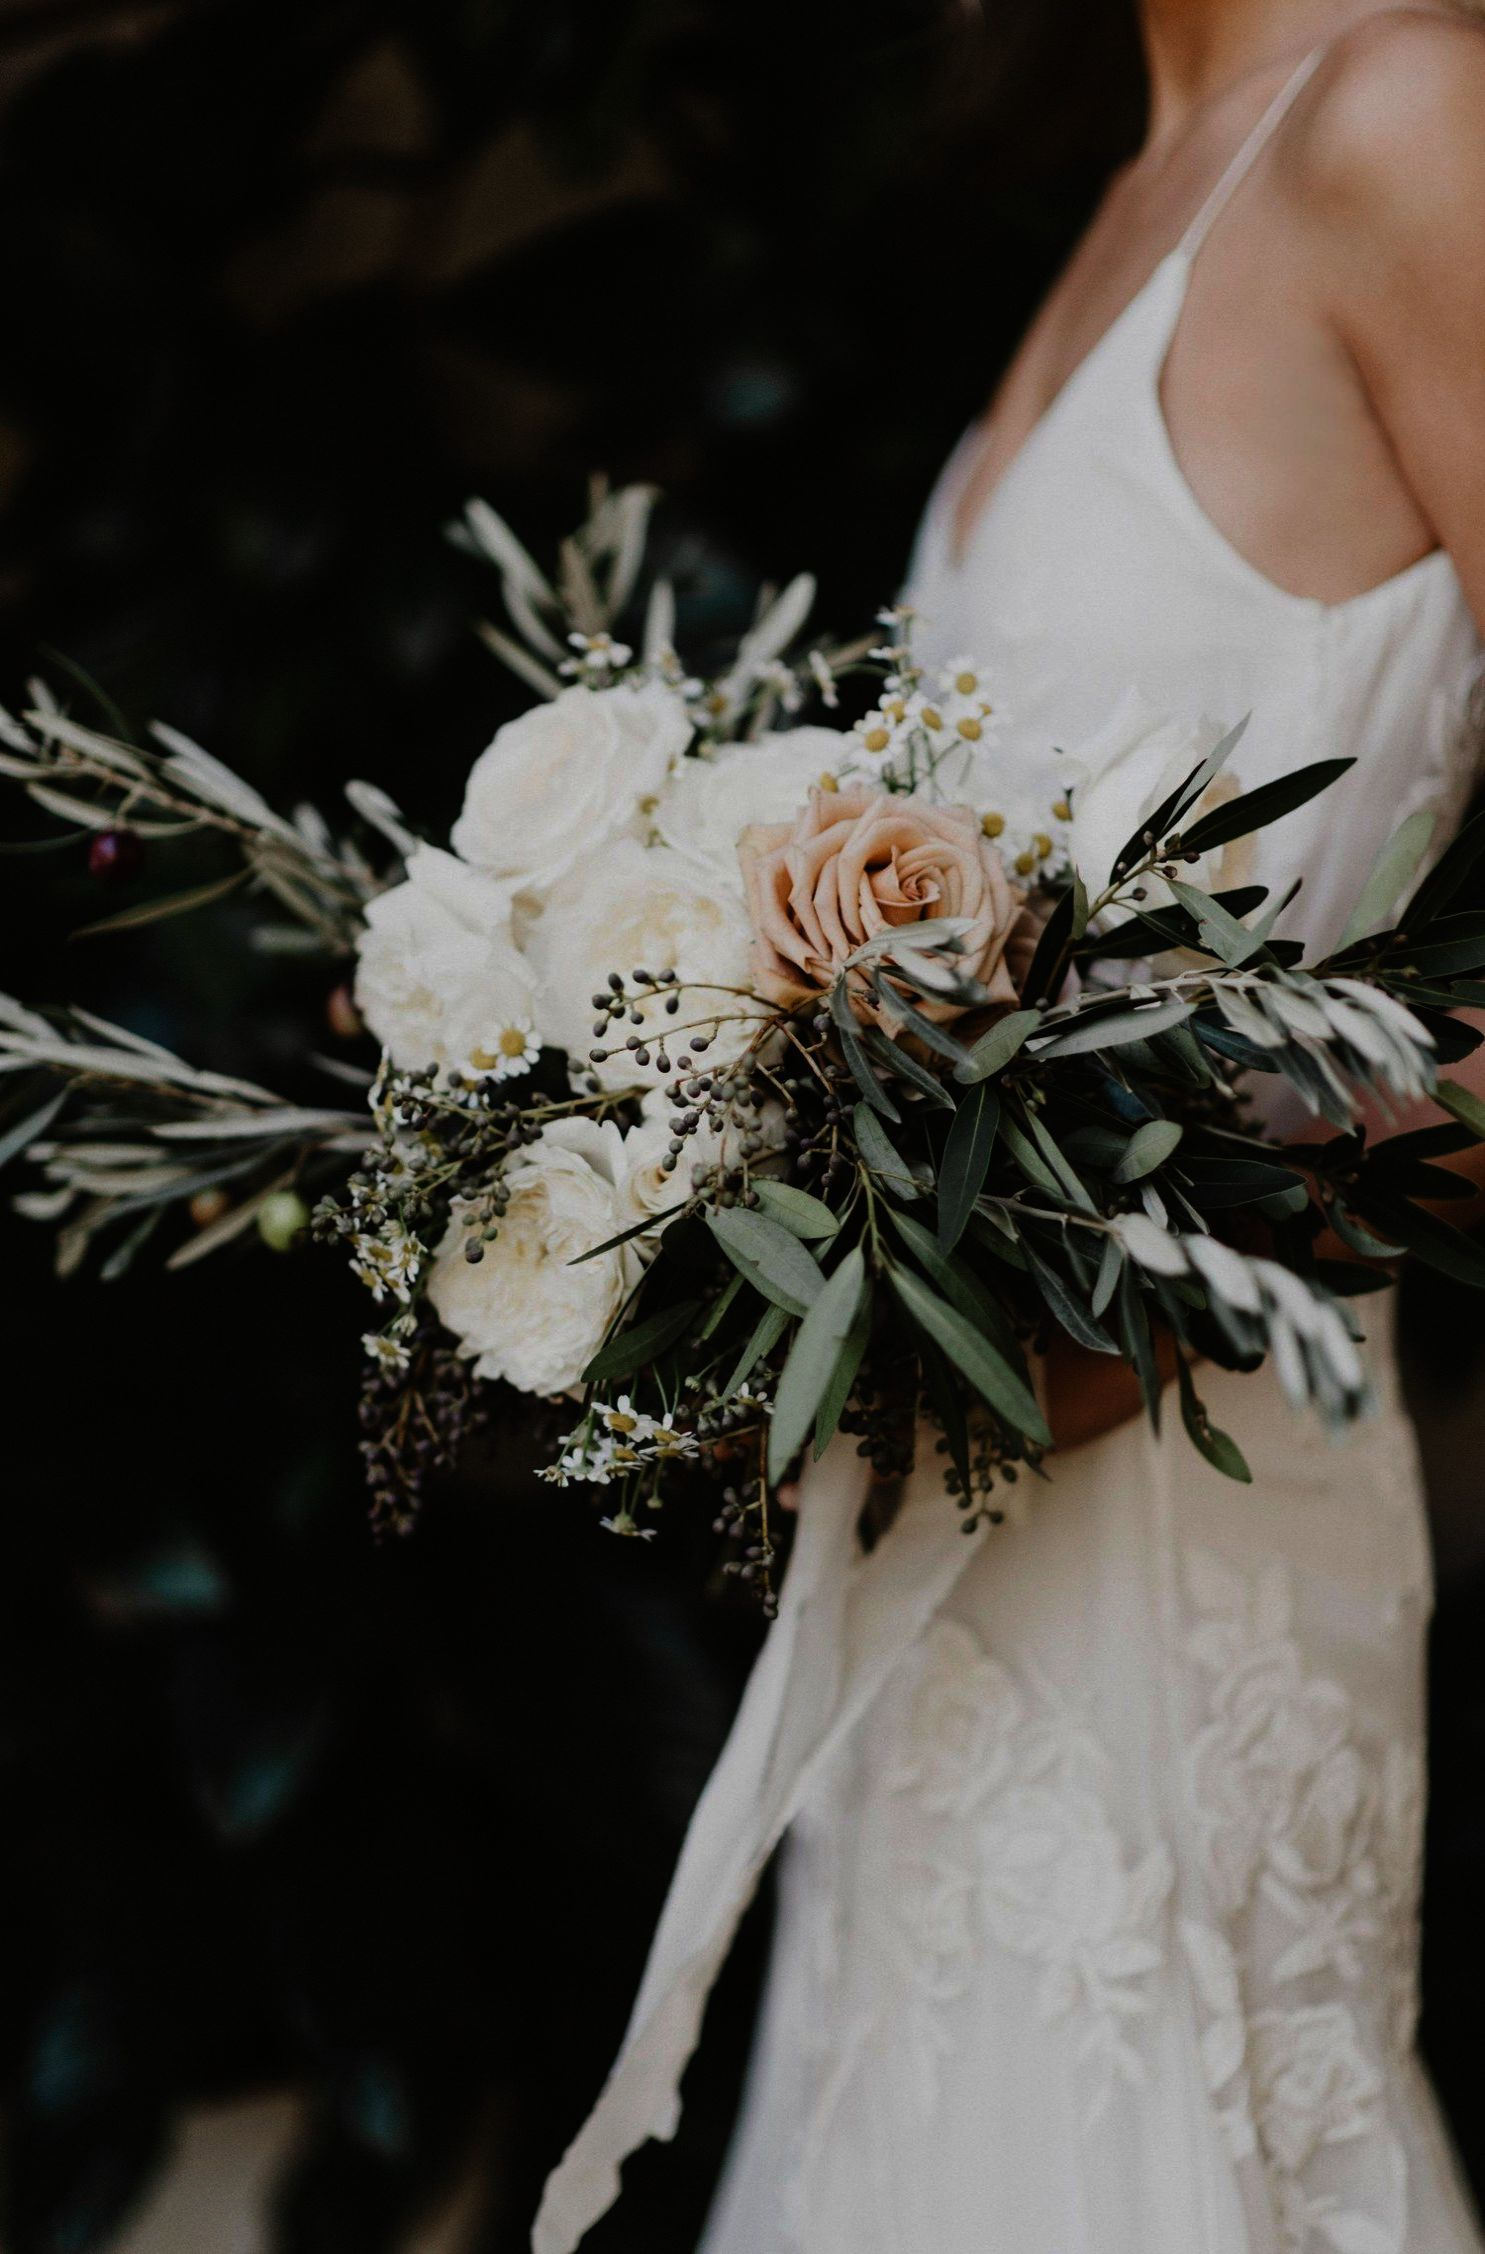 Beautiful wedding bouquets flowers wedding flowers sams club beautiful wedding bouquets flowers wedding flowers sams club izmirmasajfo